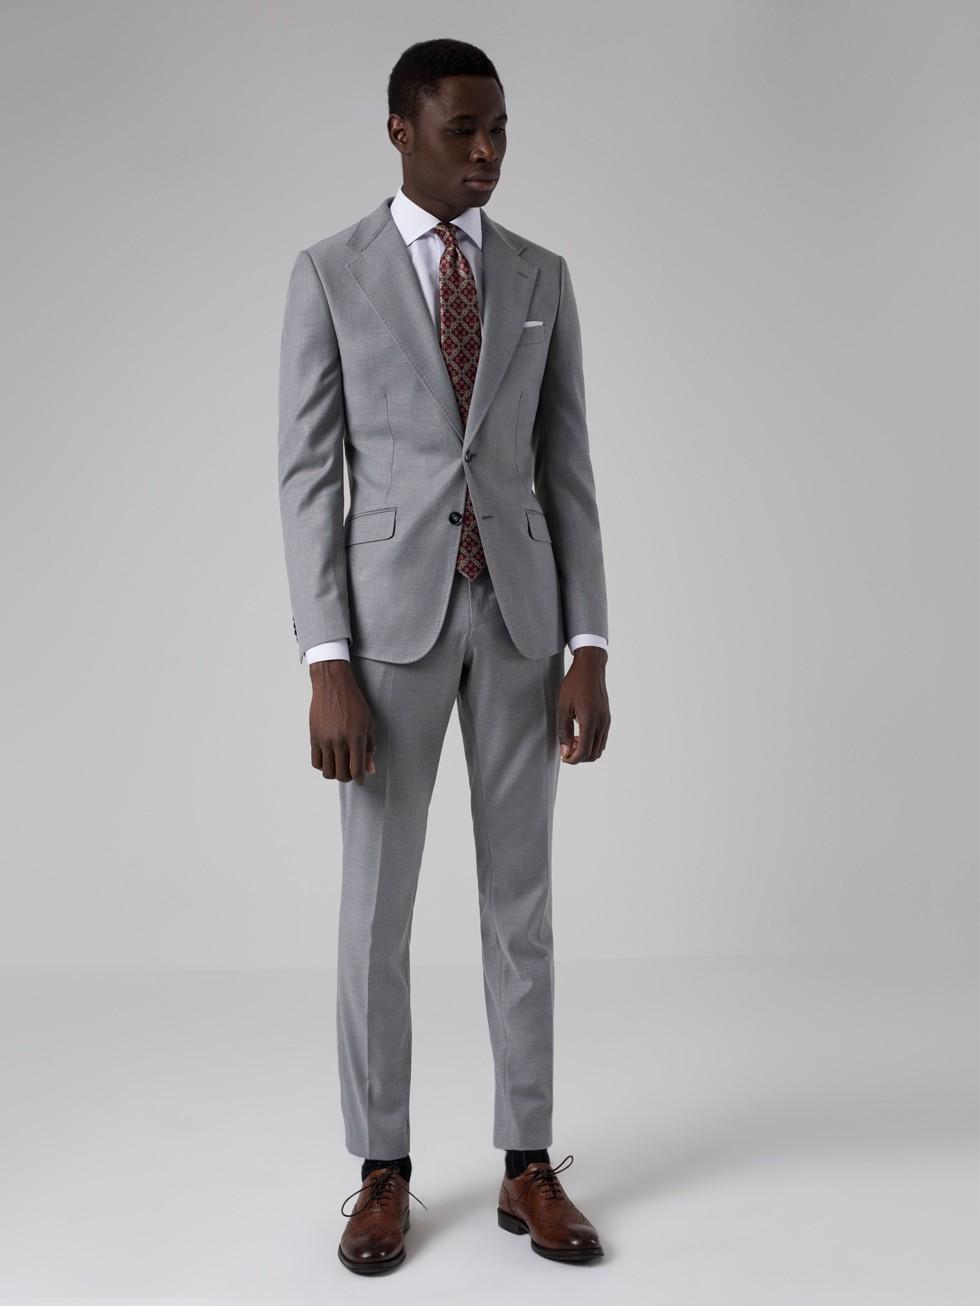 Traje slim fit gris perla traje slim fit gris perla jpg 980x1306 Trajes  slim fit beabec4e71f